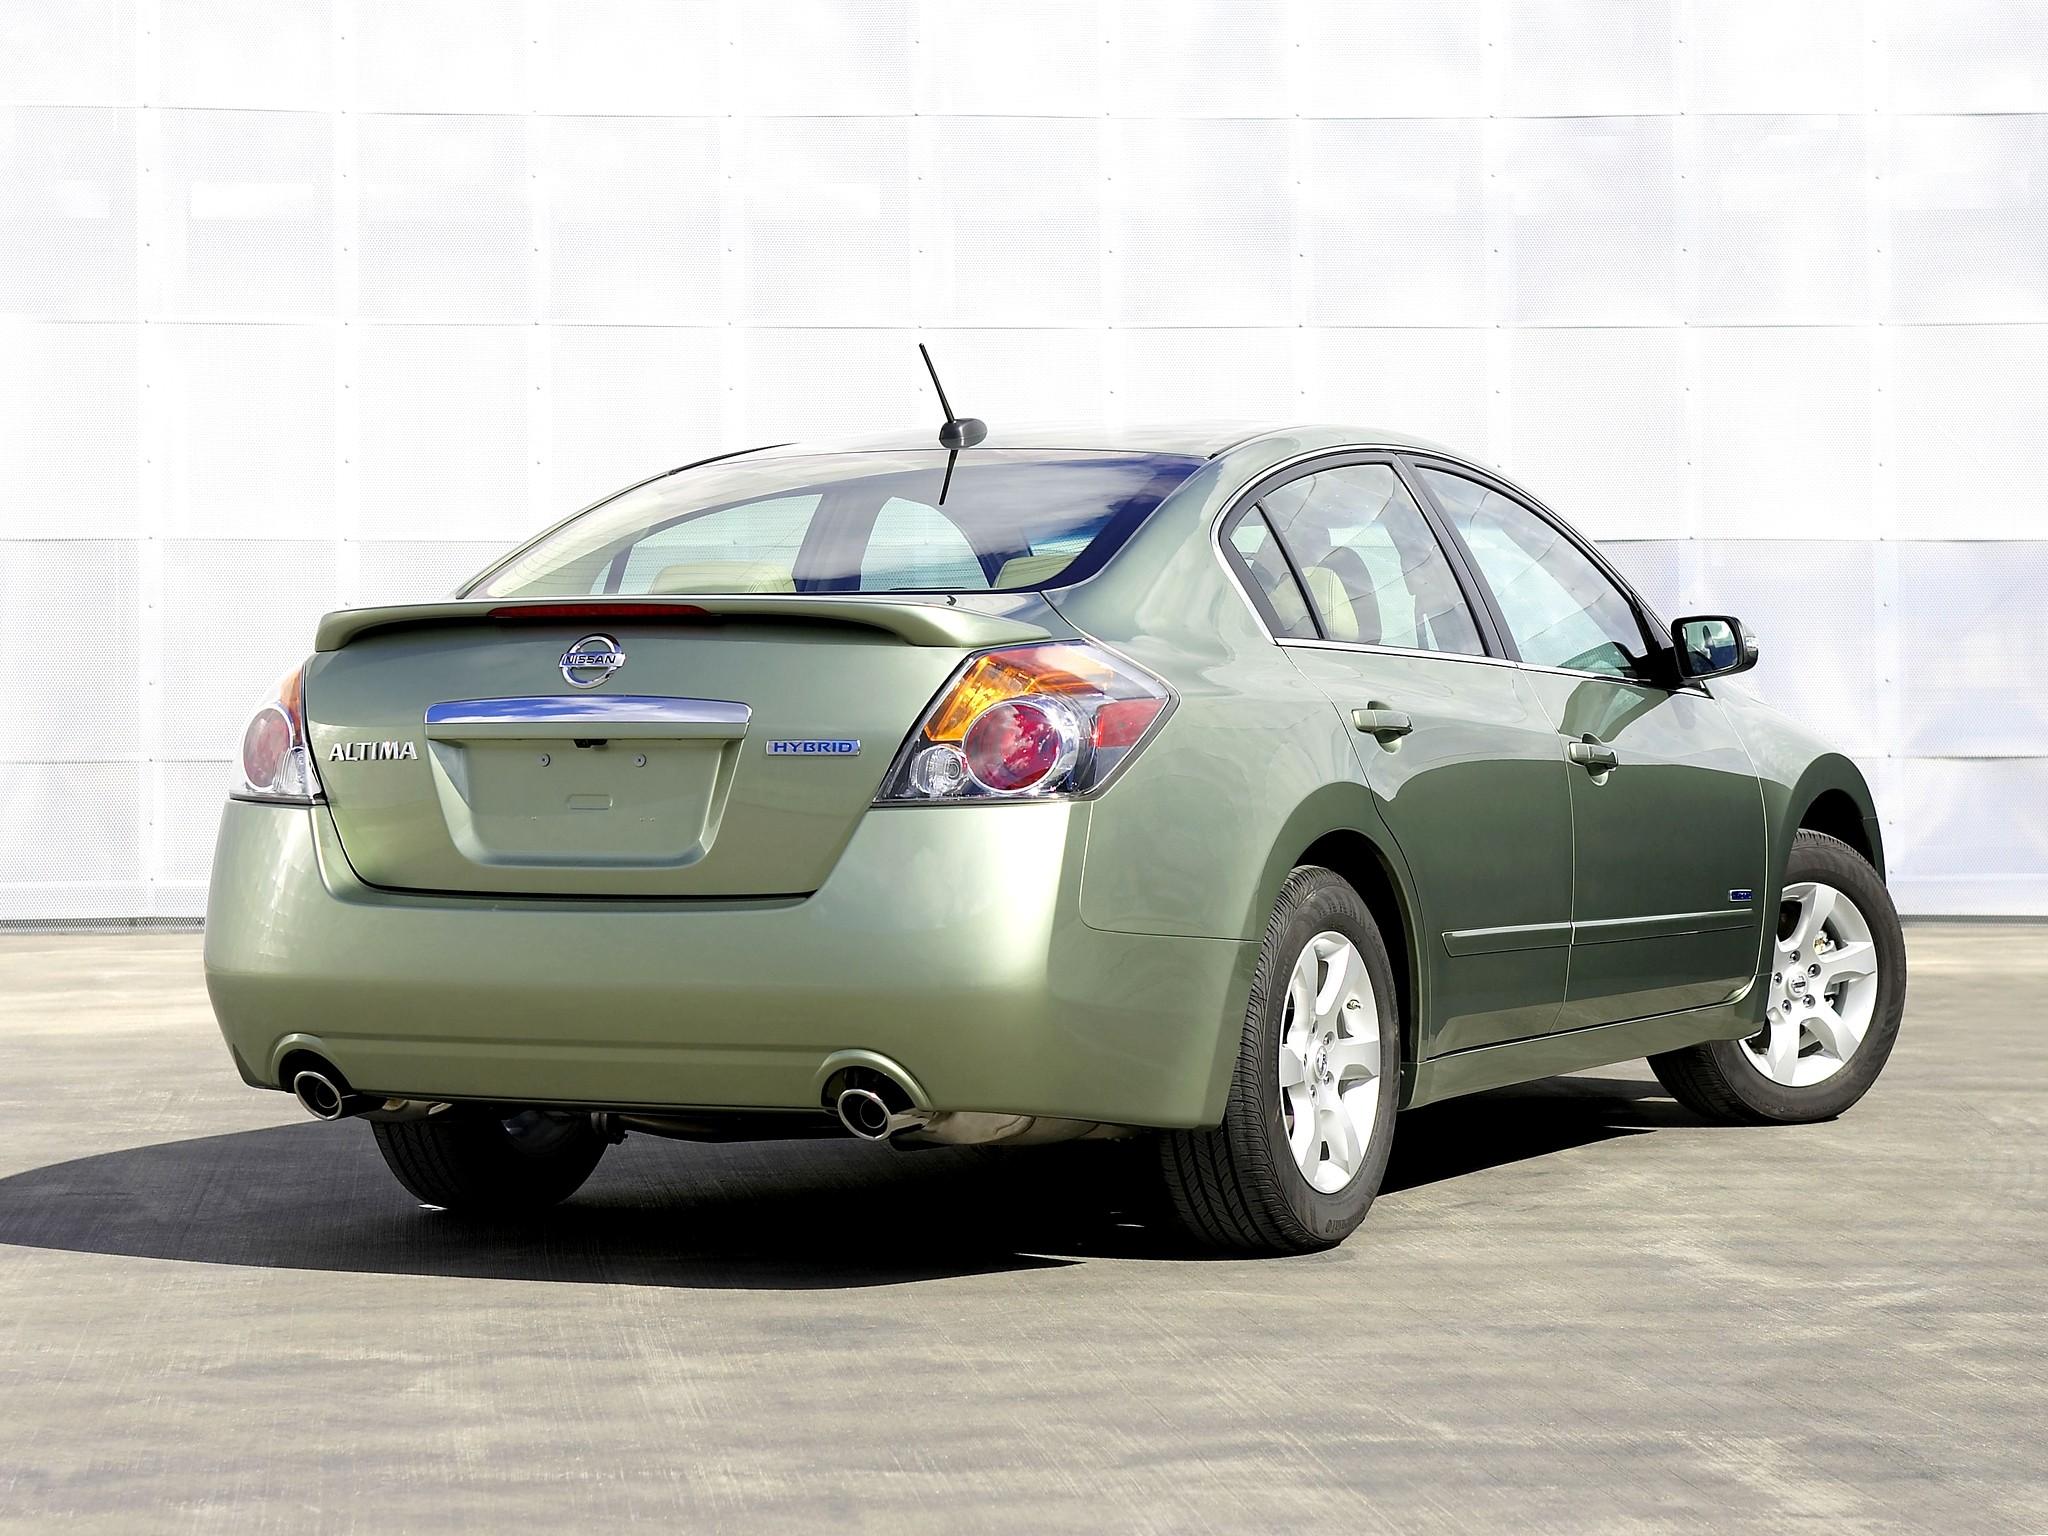 2010 Nissan Altima 2.5 S Coupe >> NISSAN Altima - 2007, 2008, 2009, 2010, 2011, 2012 - autoevolution